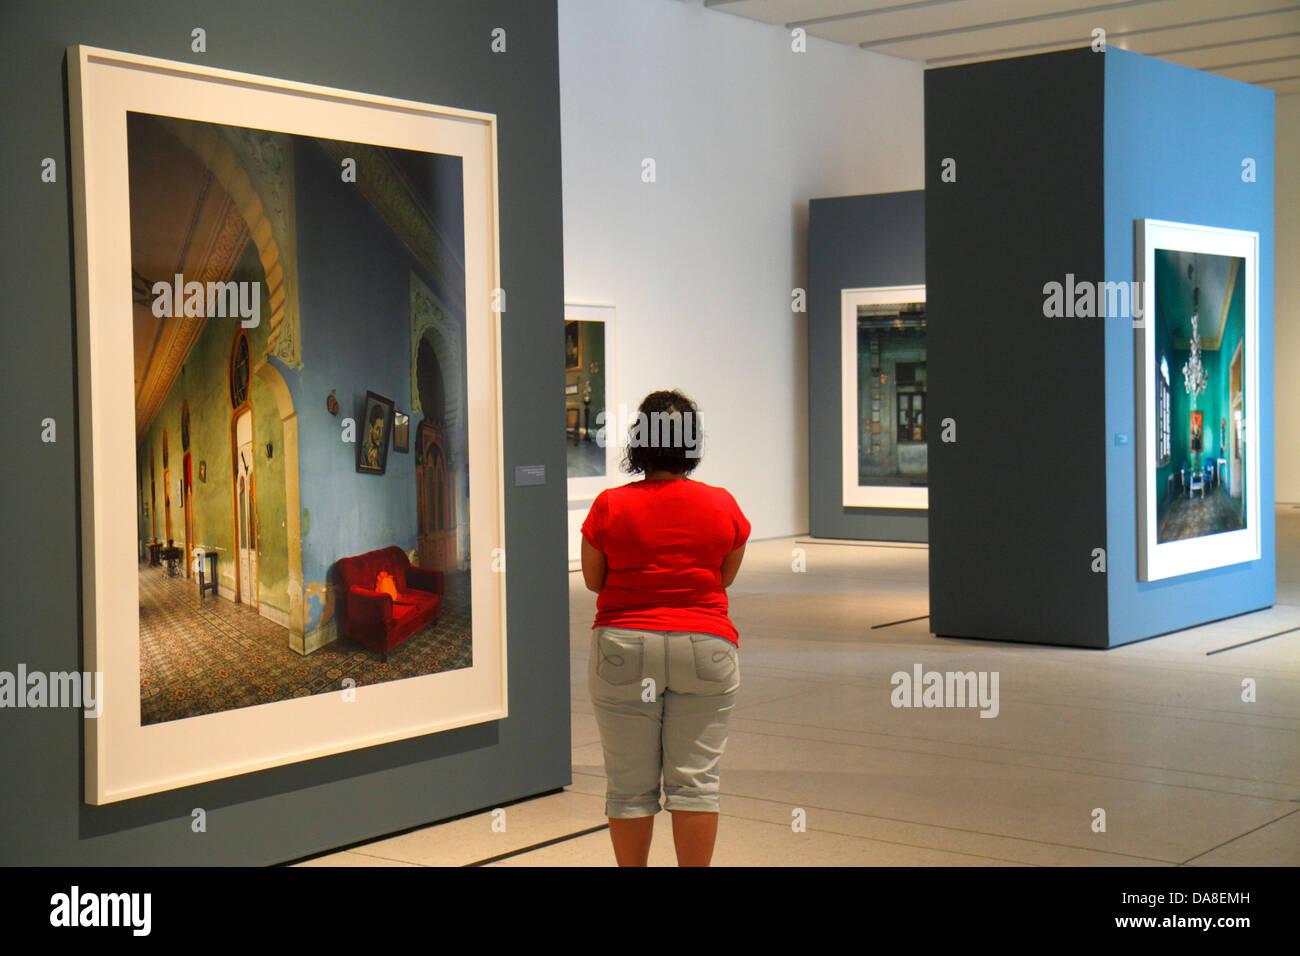 Tampa Florida Tampa Museum of Art gallery inside looking appreciating Hispanic woman photographs - Stock Image